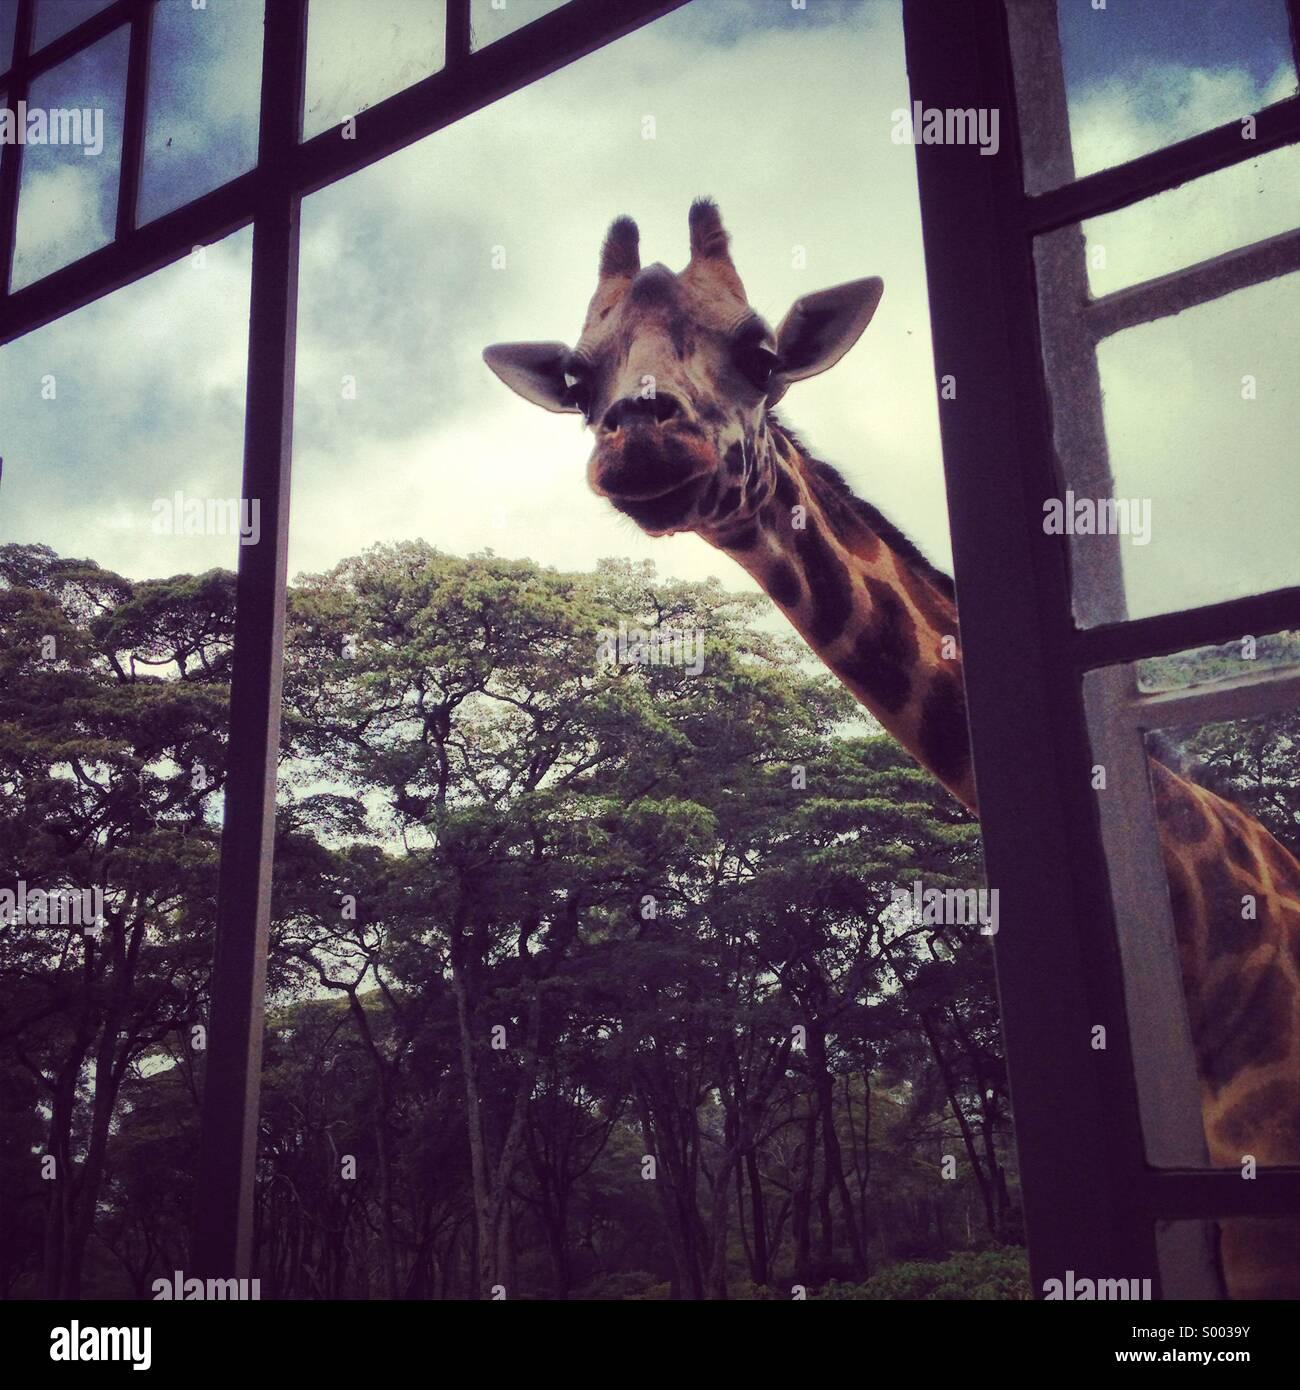 Giraffe looking through the window - Stock Image